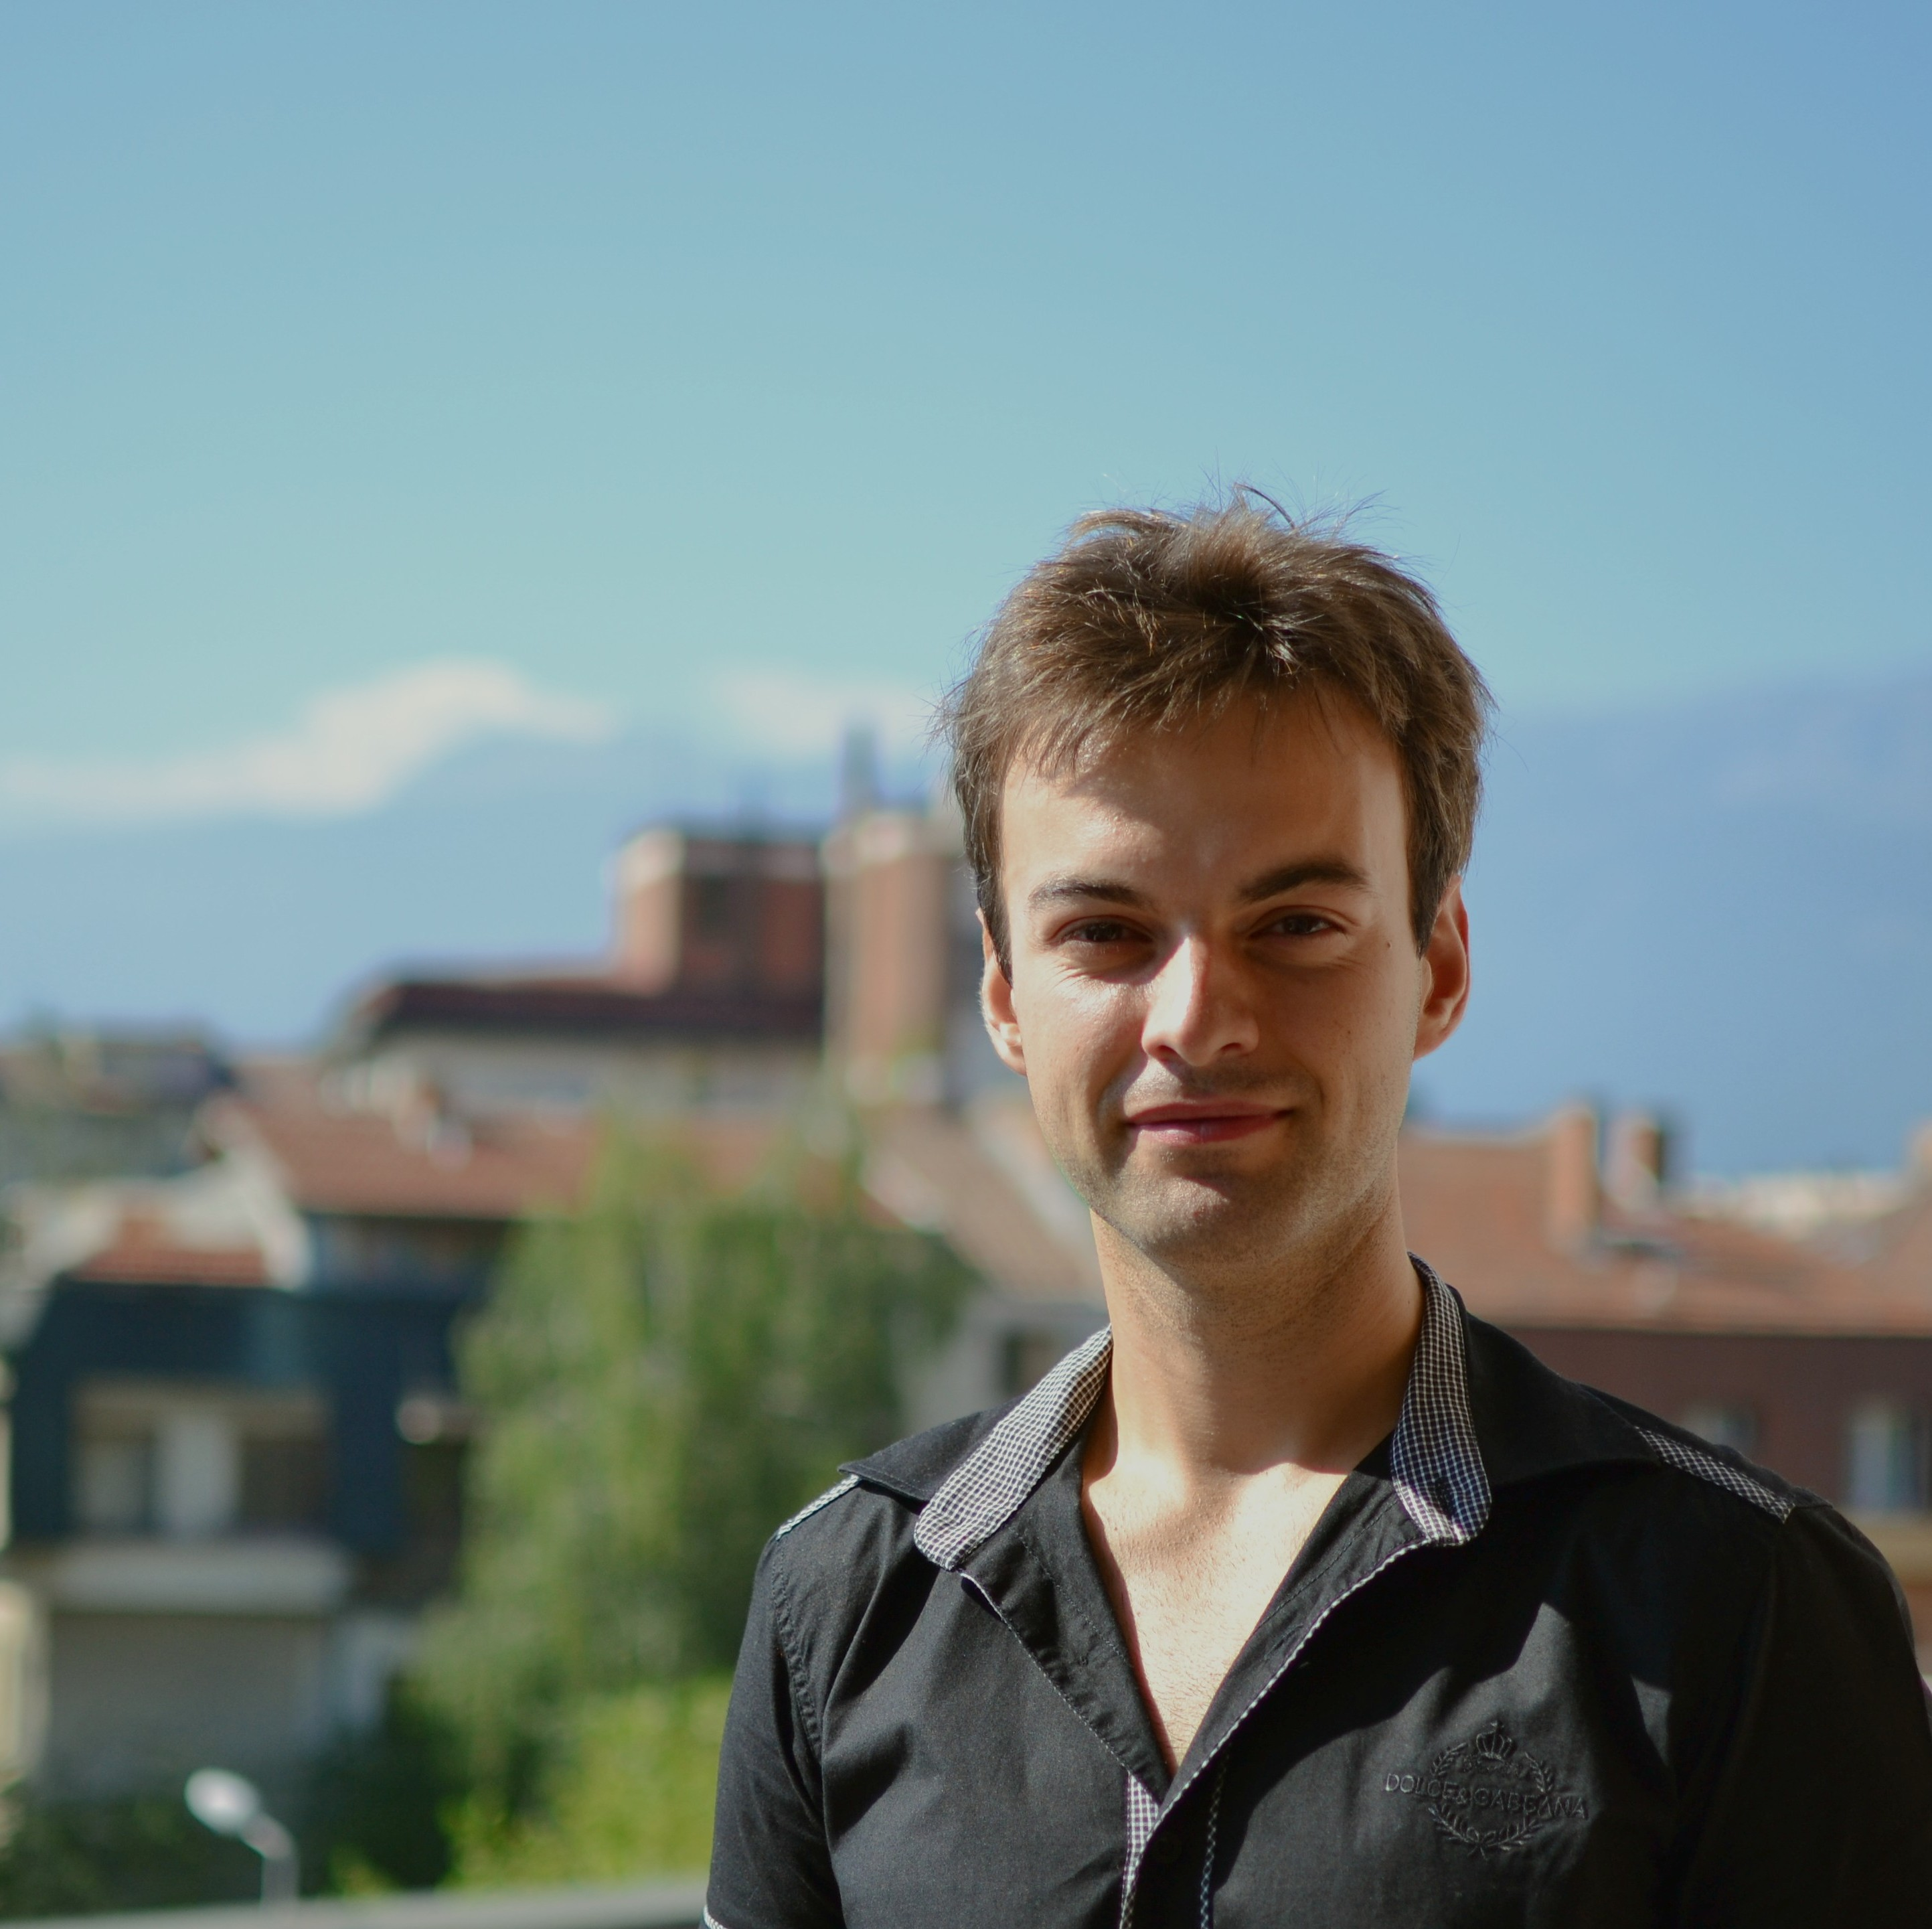 Stoyan Stoyanov's photo